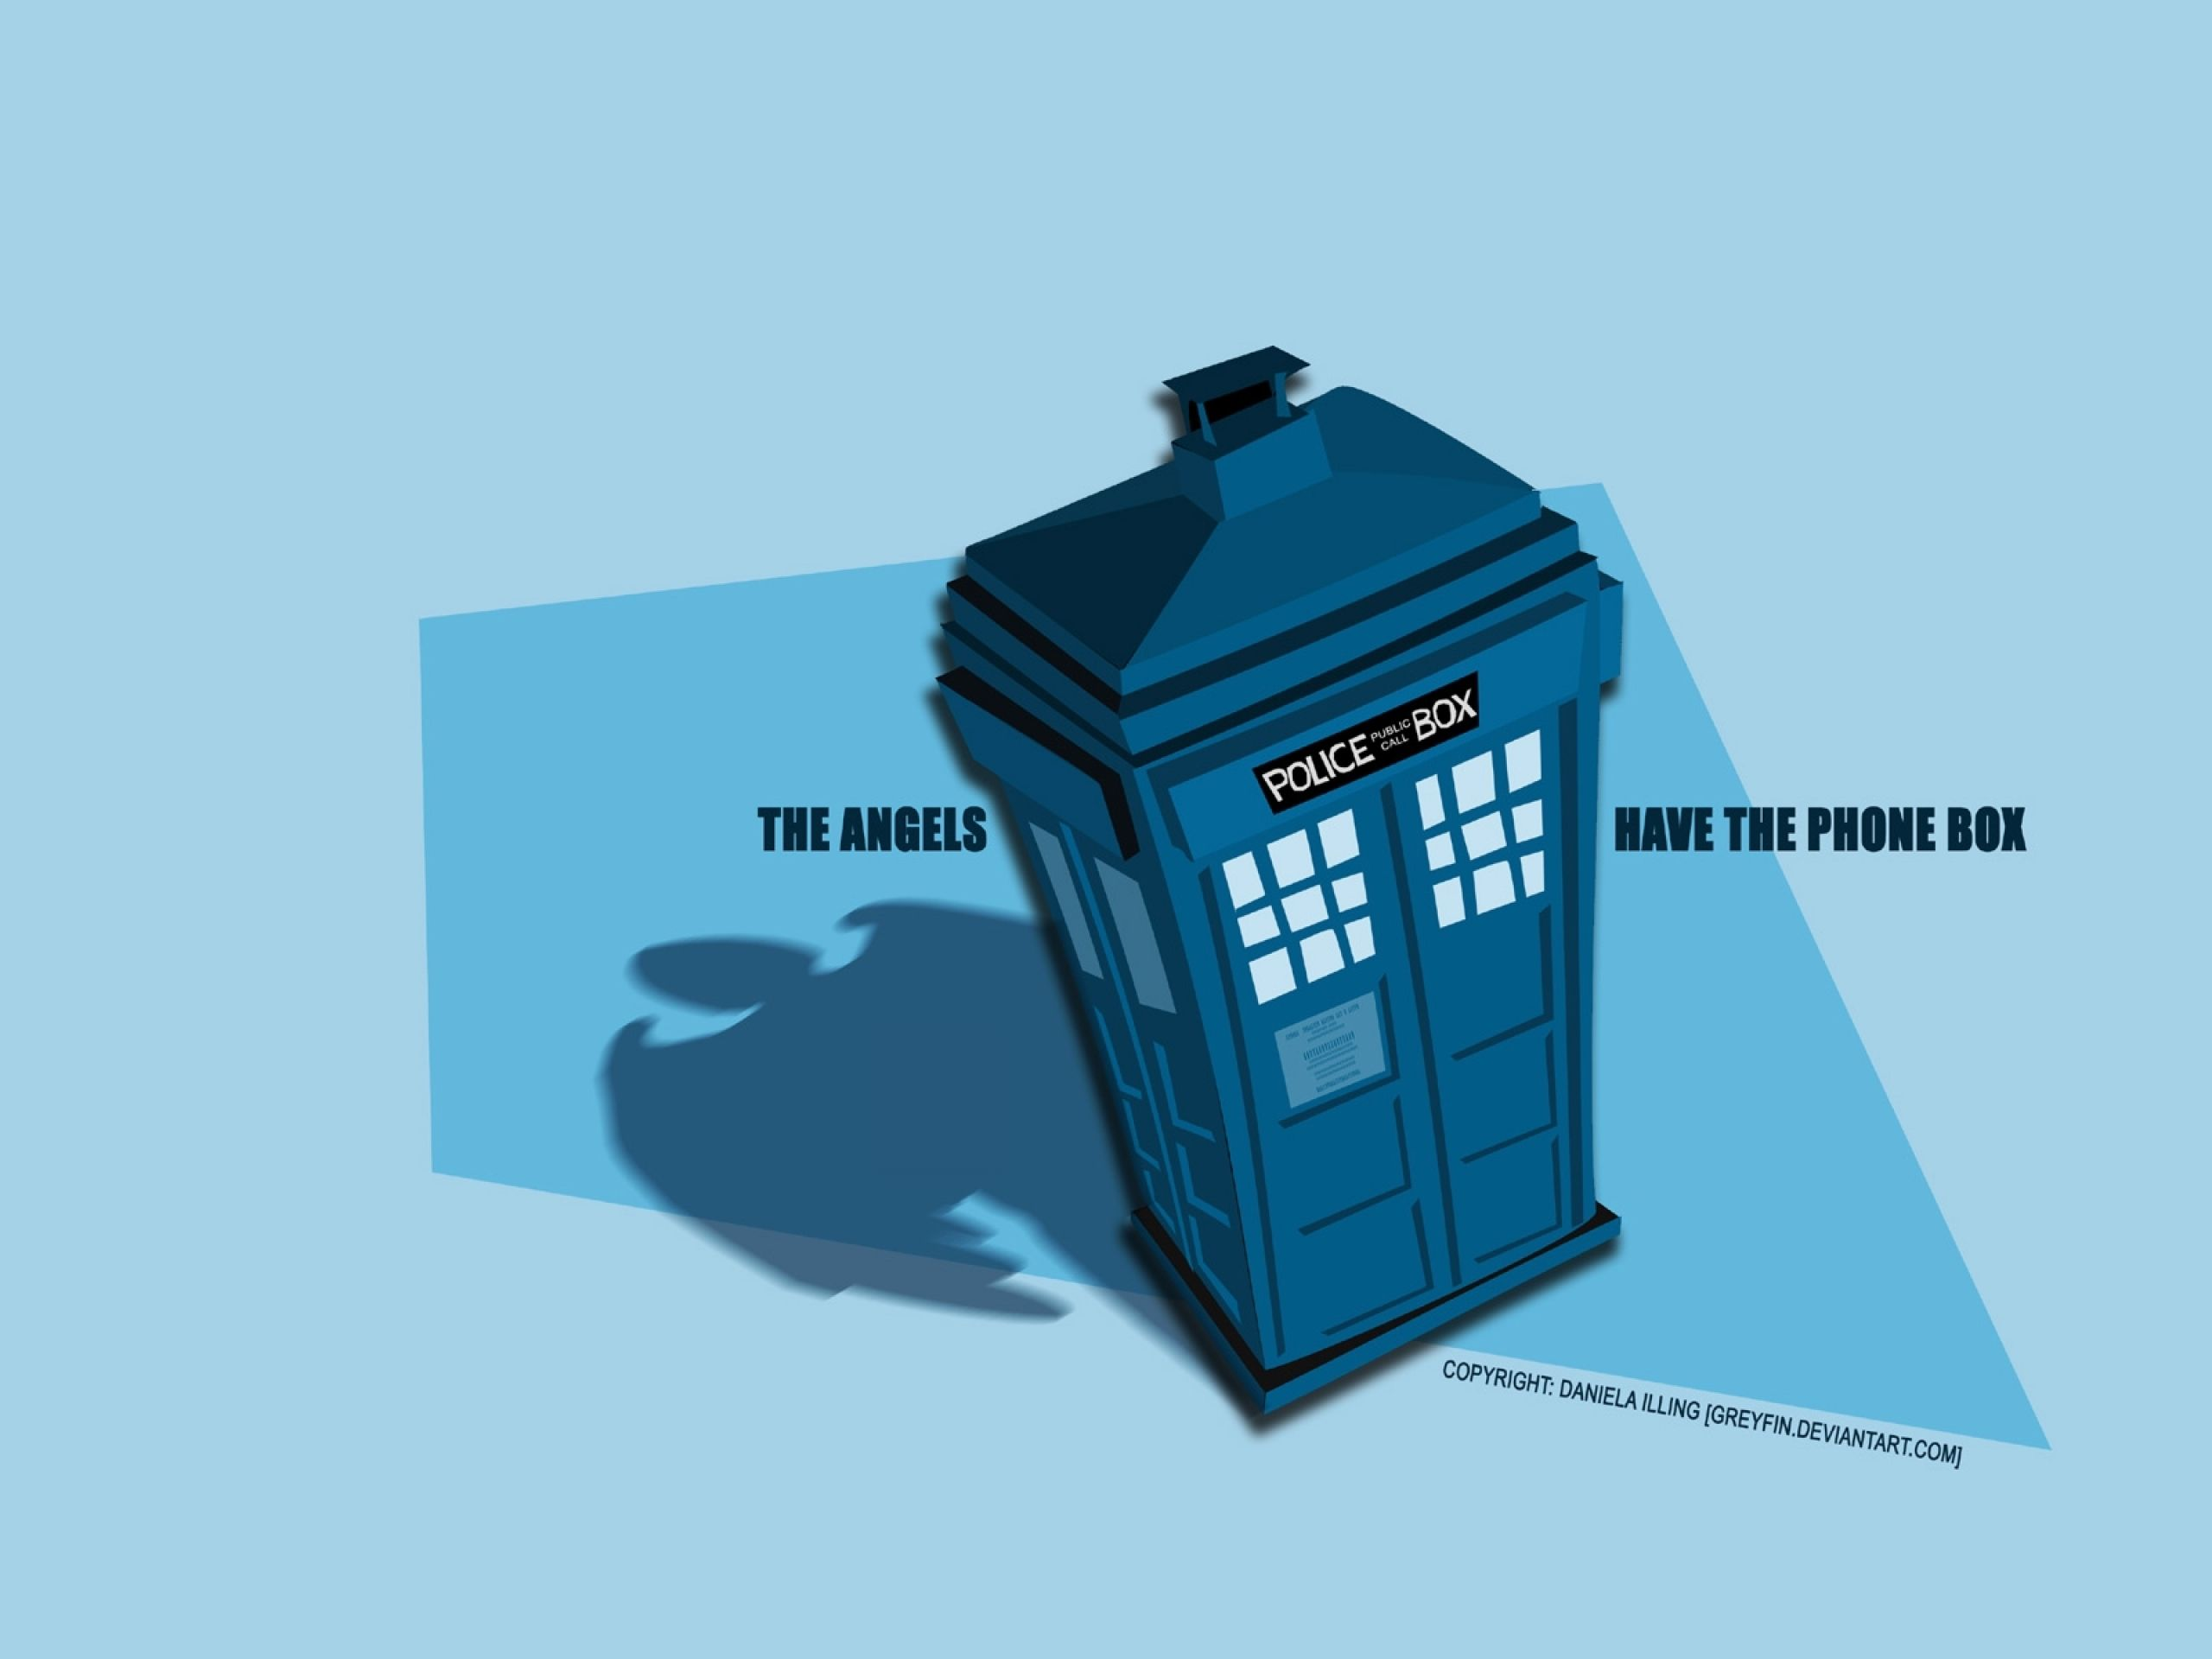 tardis doctor who weeping angel 1600x1200 wallpaper Art HD